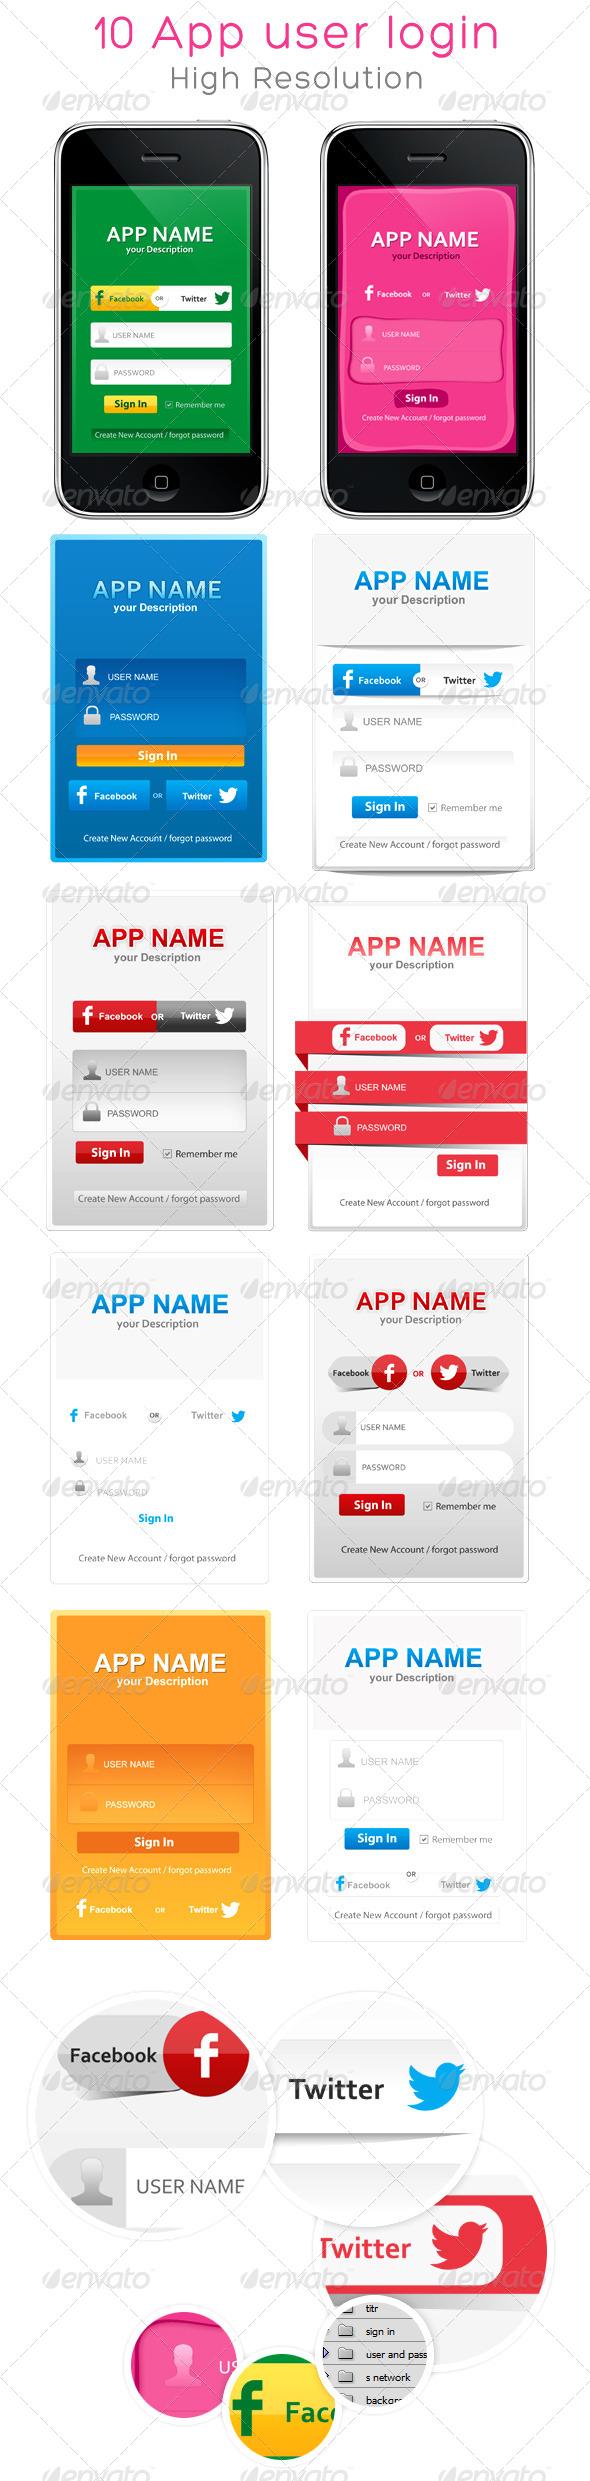 GraphicRiver 10 Application User Login 4473541